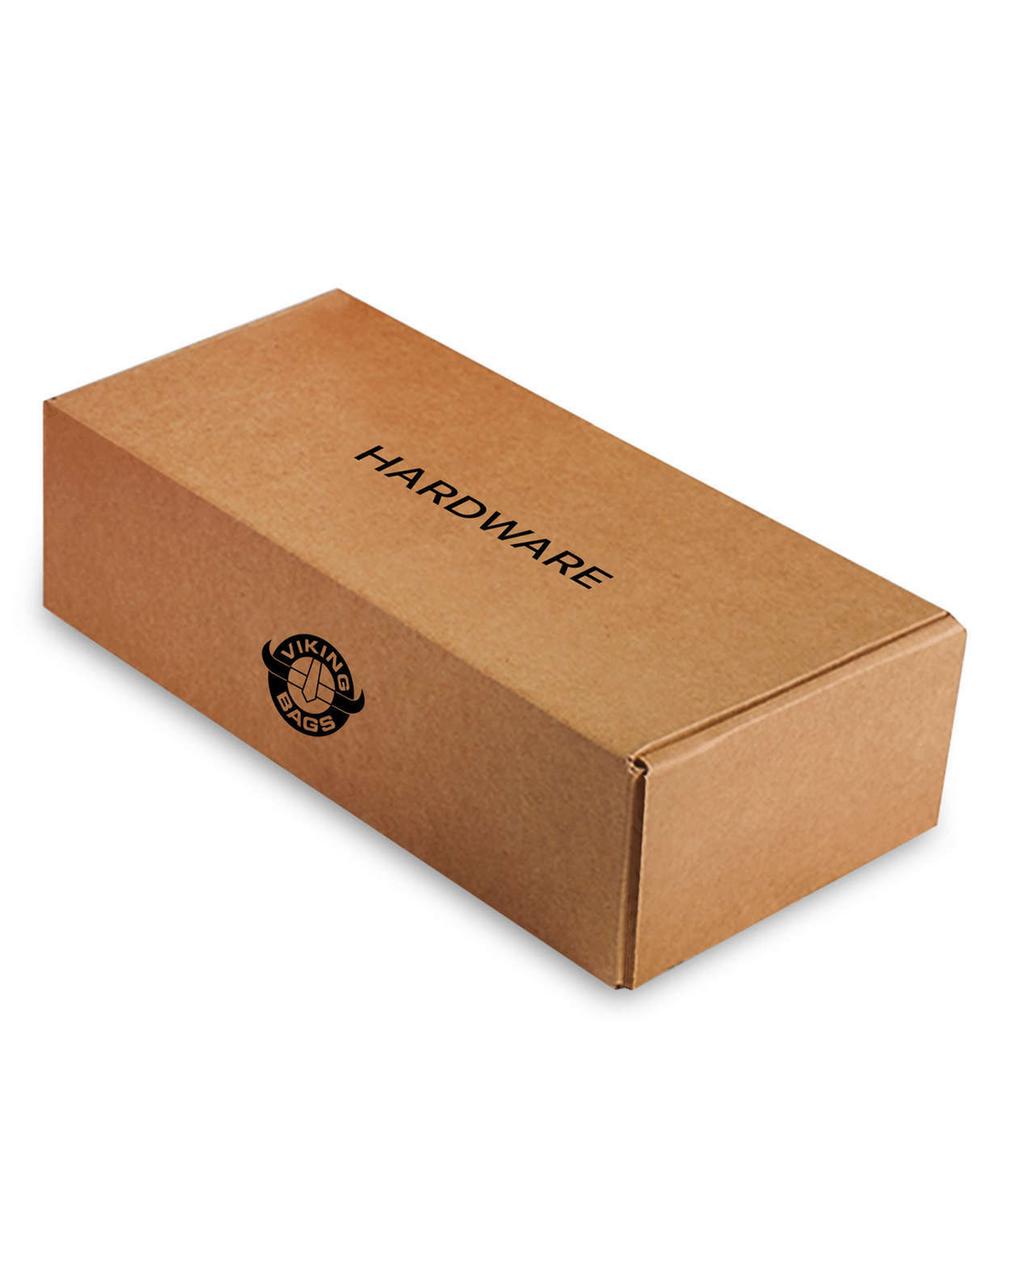 Honda 1100 Shadow Sabre Slant Medium Motorcycle Saddlebags Hardware Box